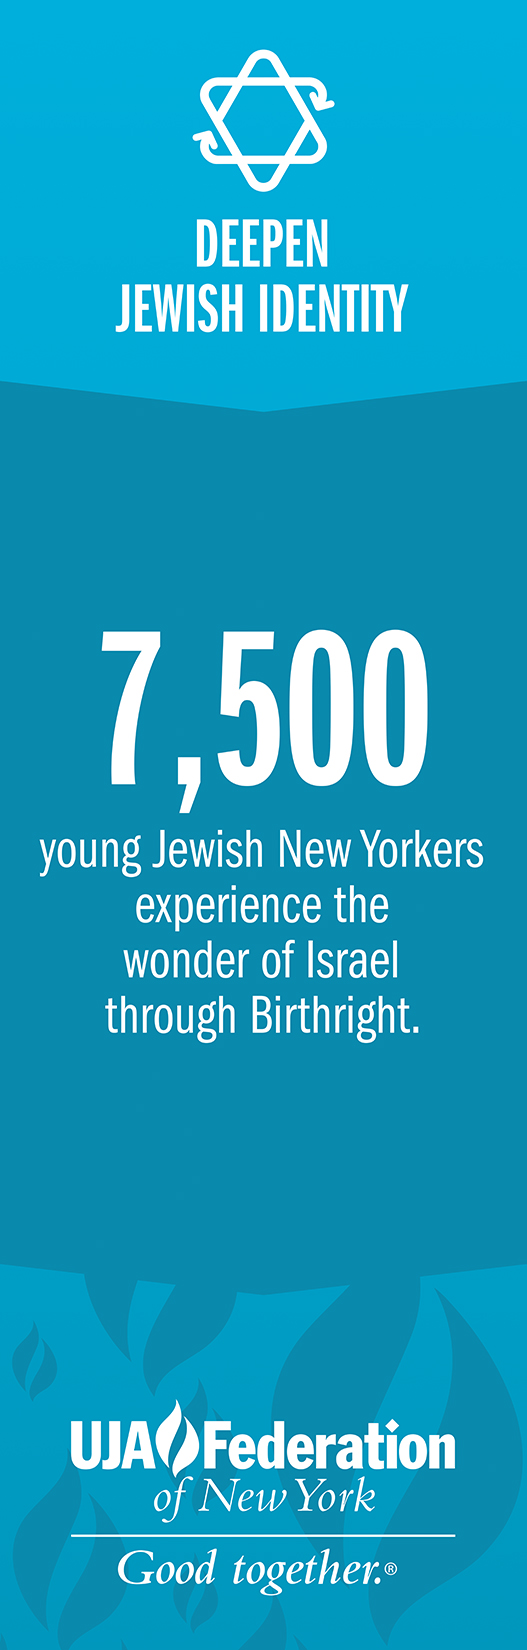 UJA Jewish Identity Banner v02r05 BACK.jpg